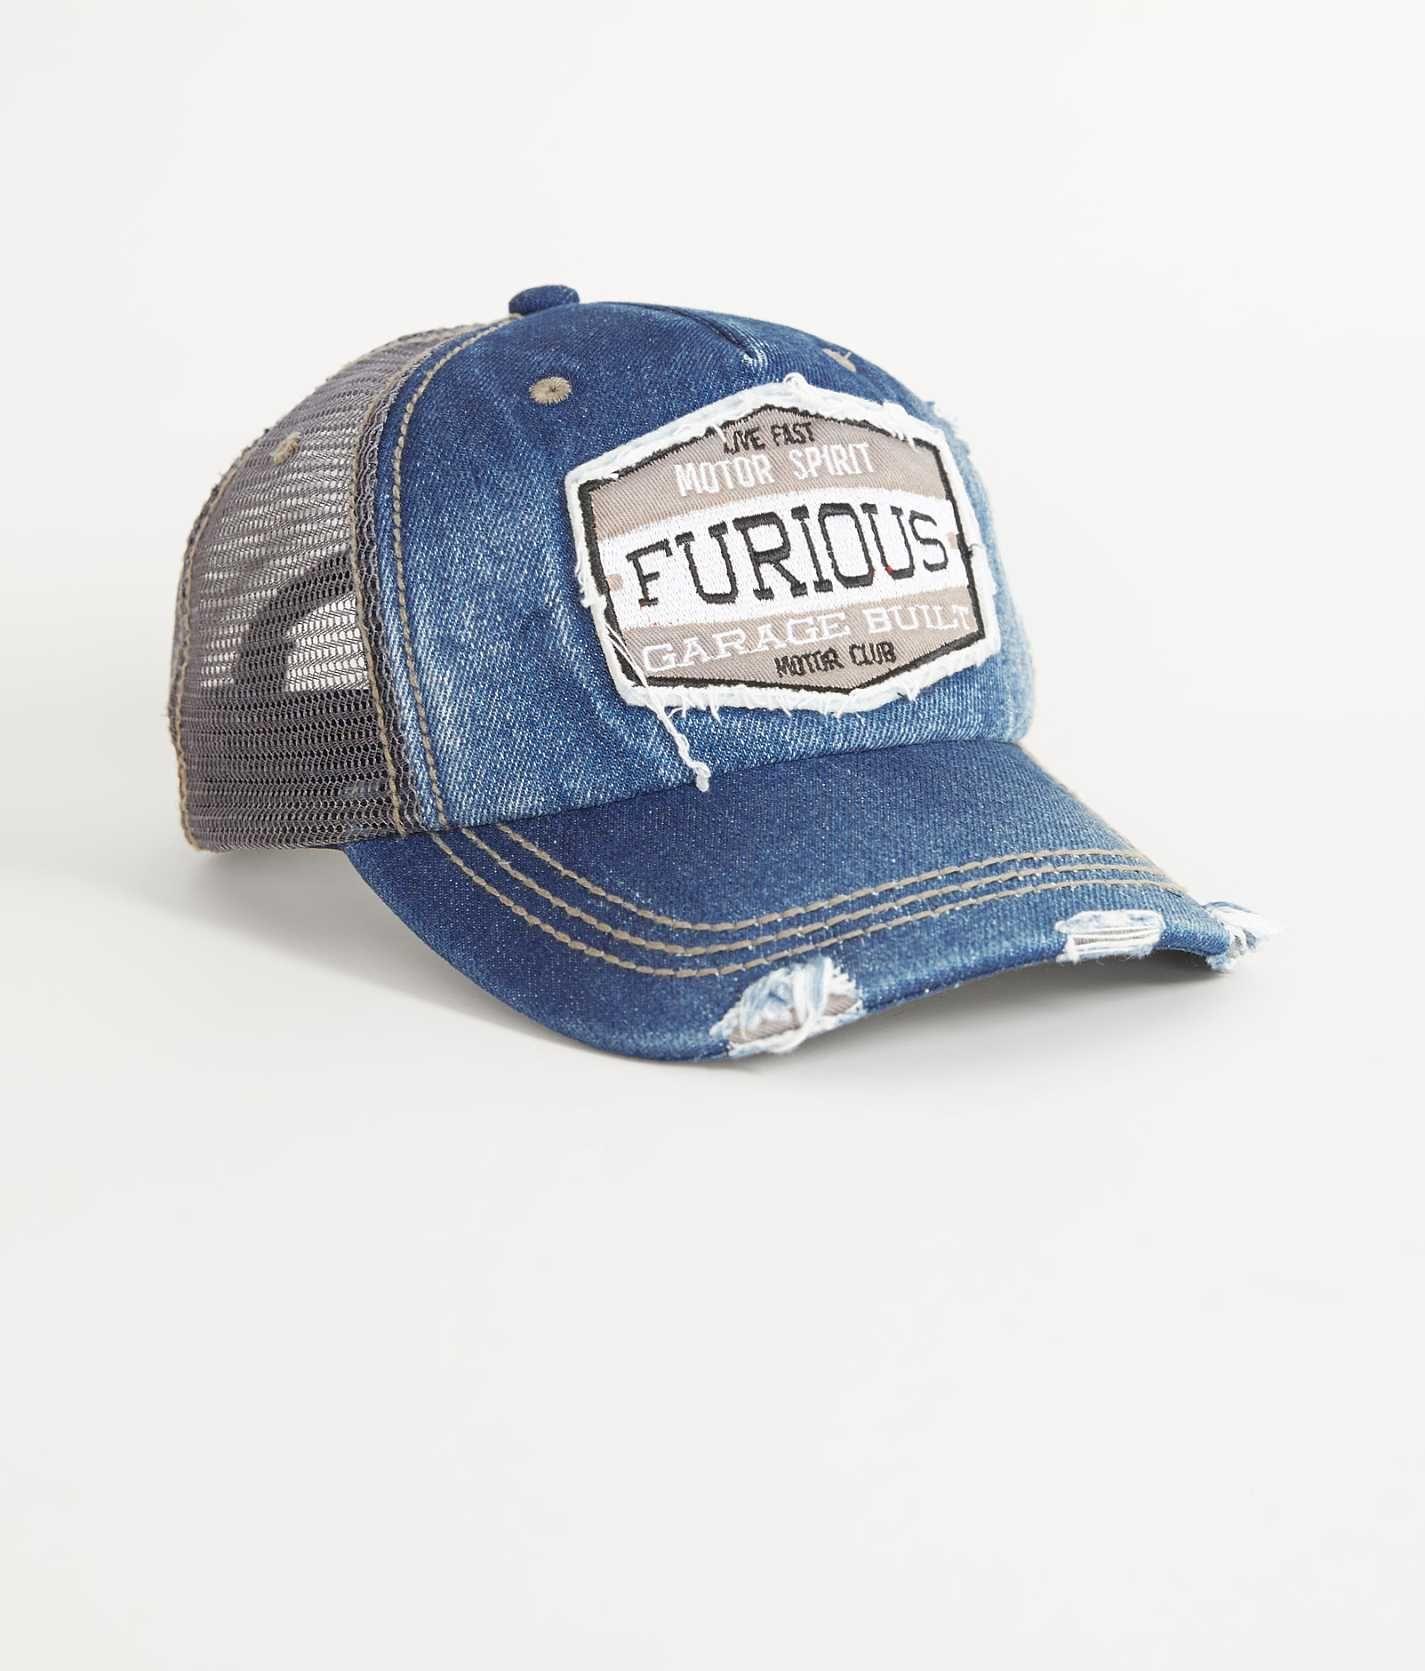 9e6f4dbf9e158 Fast   Furious Burnout Trucker Hat - Men s Hats in Denim